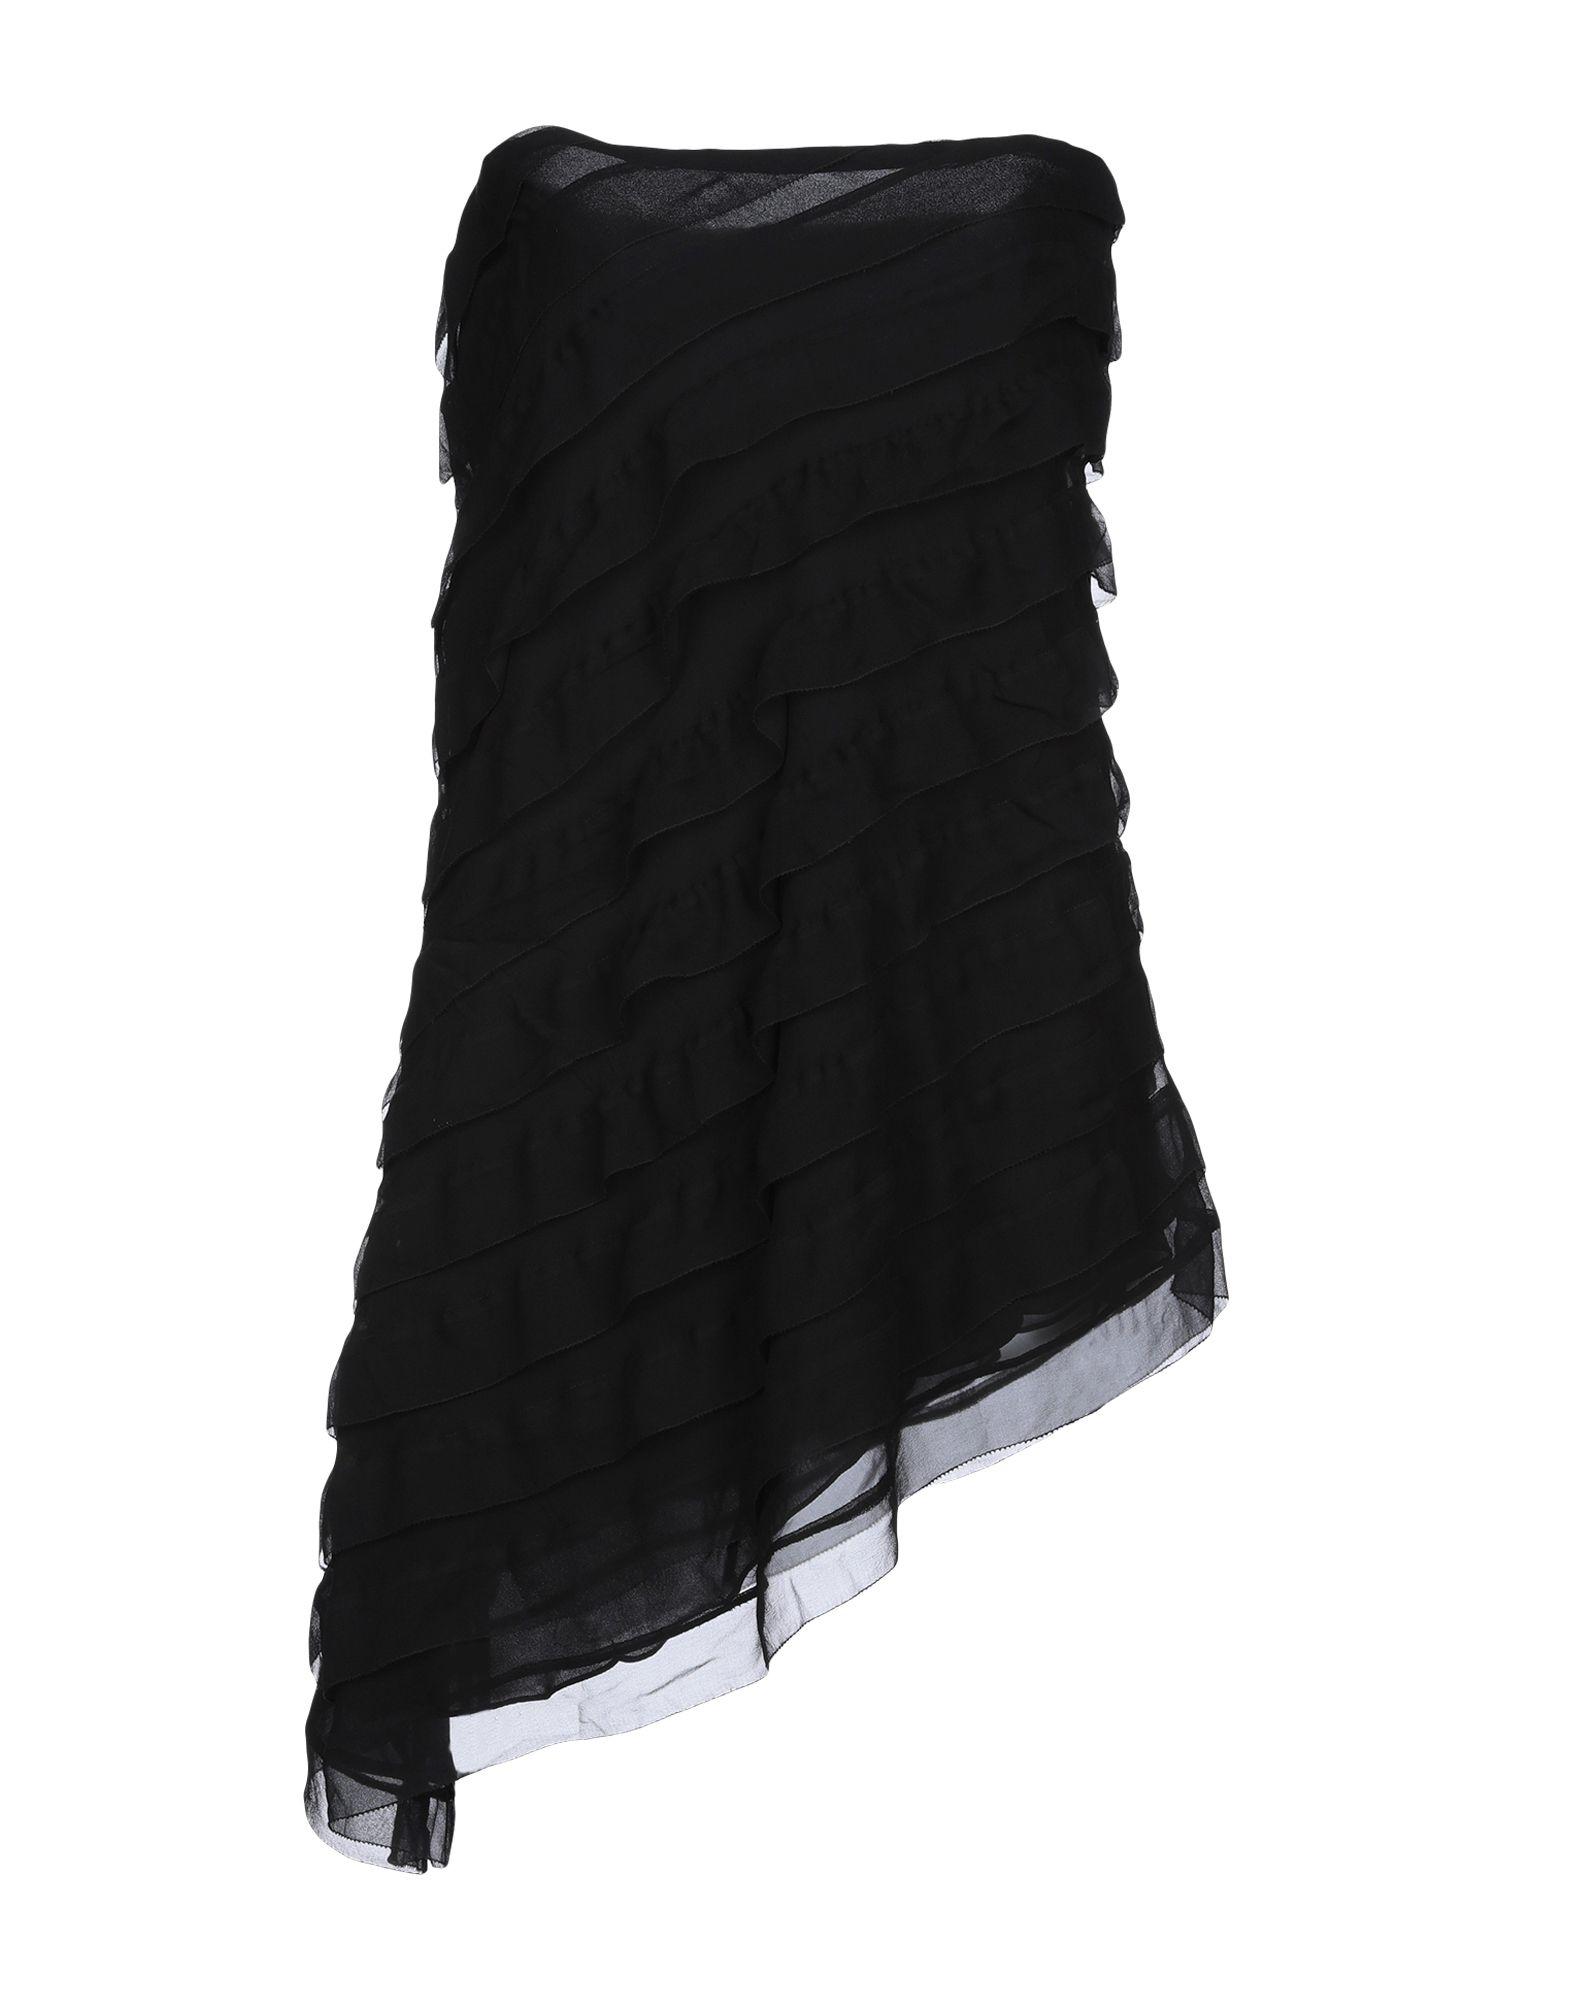 RALPH LAUREN BLACK LABEL Бюстье ralph lauren black label блузка